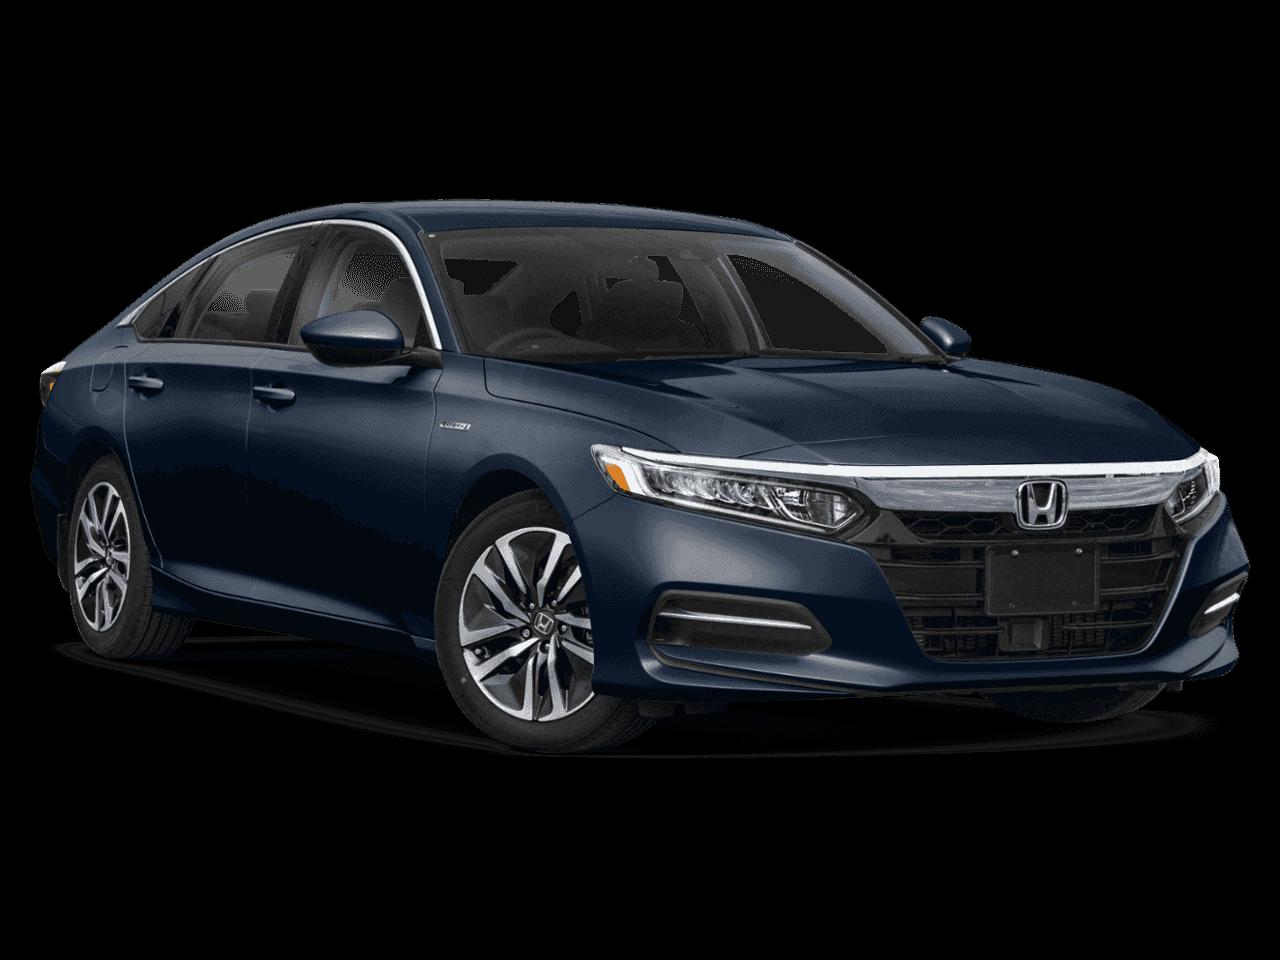 Honda Accord седан